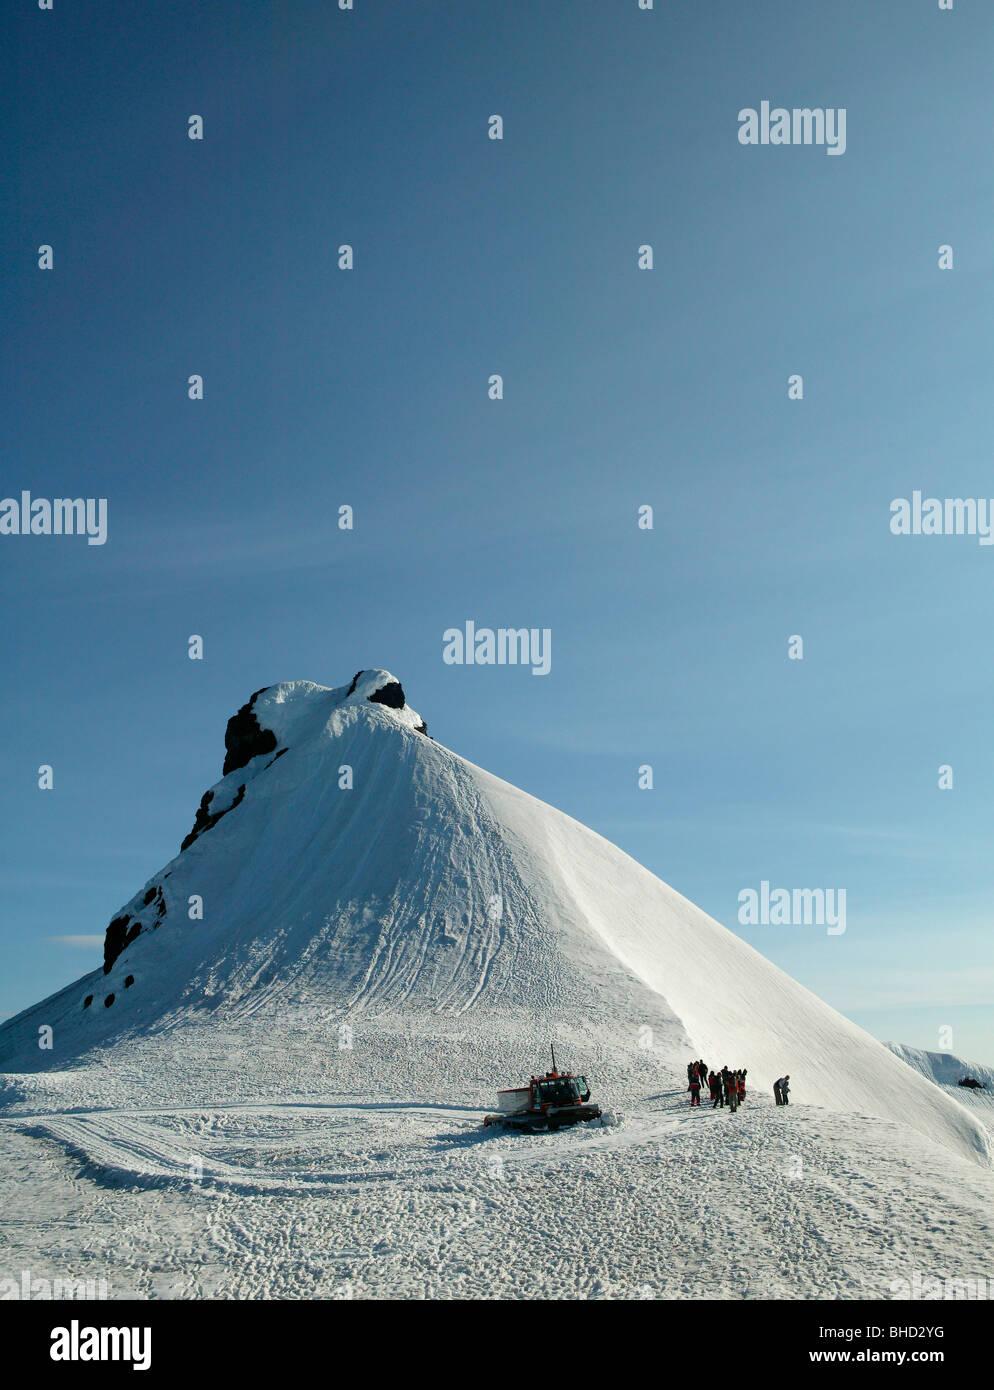 People walking on Snaefellsjokull Glacier, Snaefellsnes Peninsula, Iceland - Stock Image